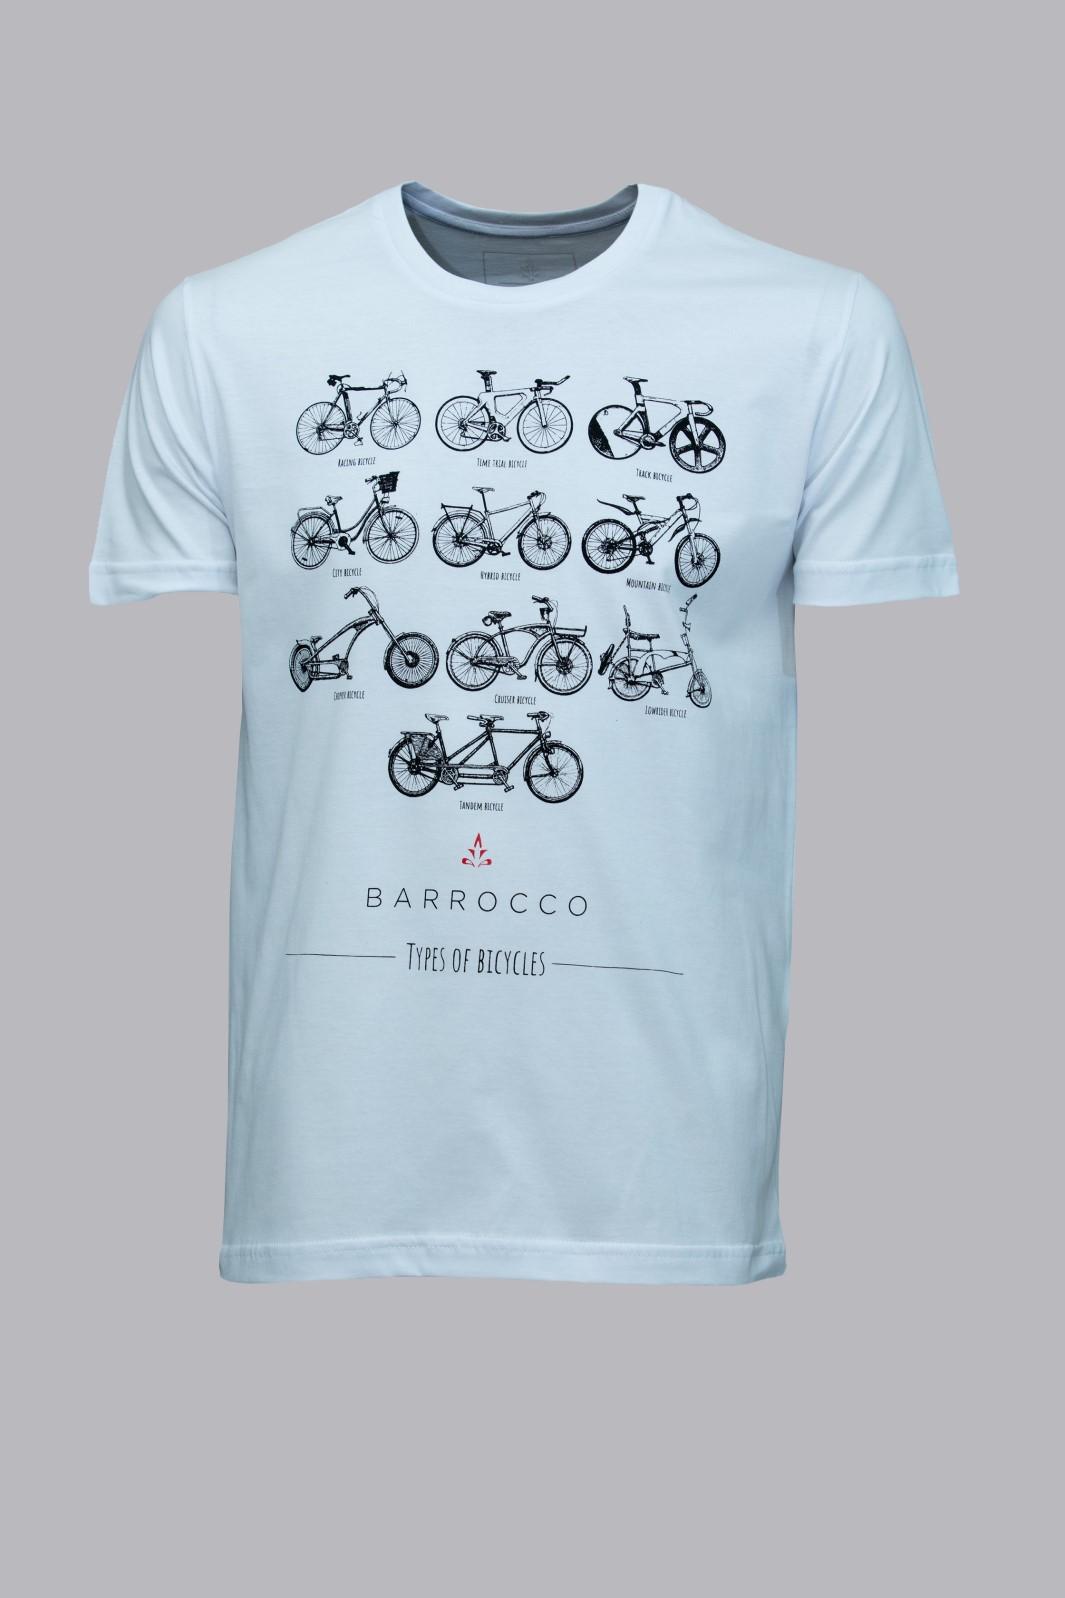 Camiseta Barrocco Types of Bicycle